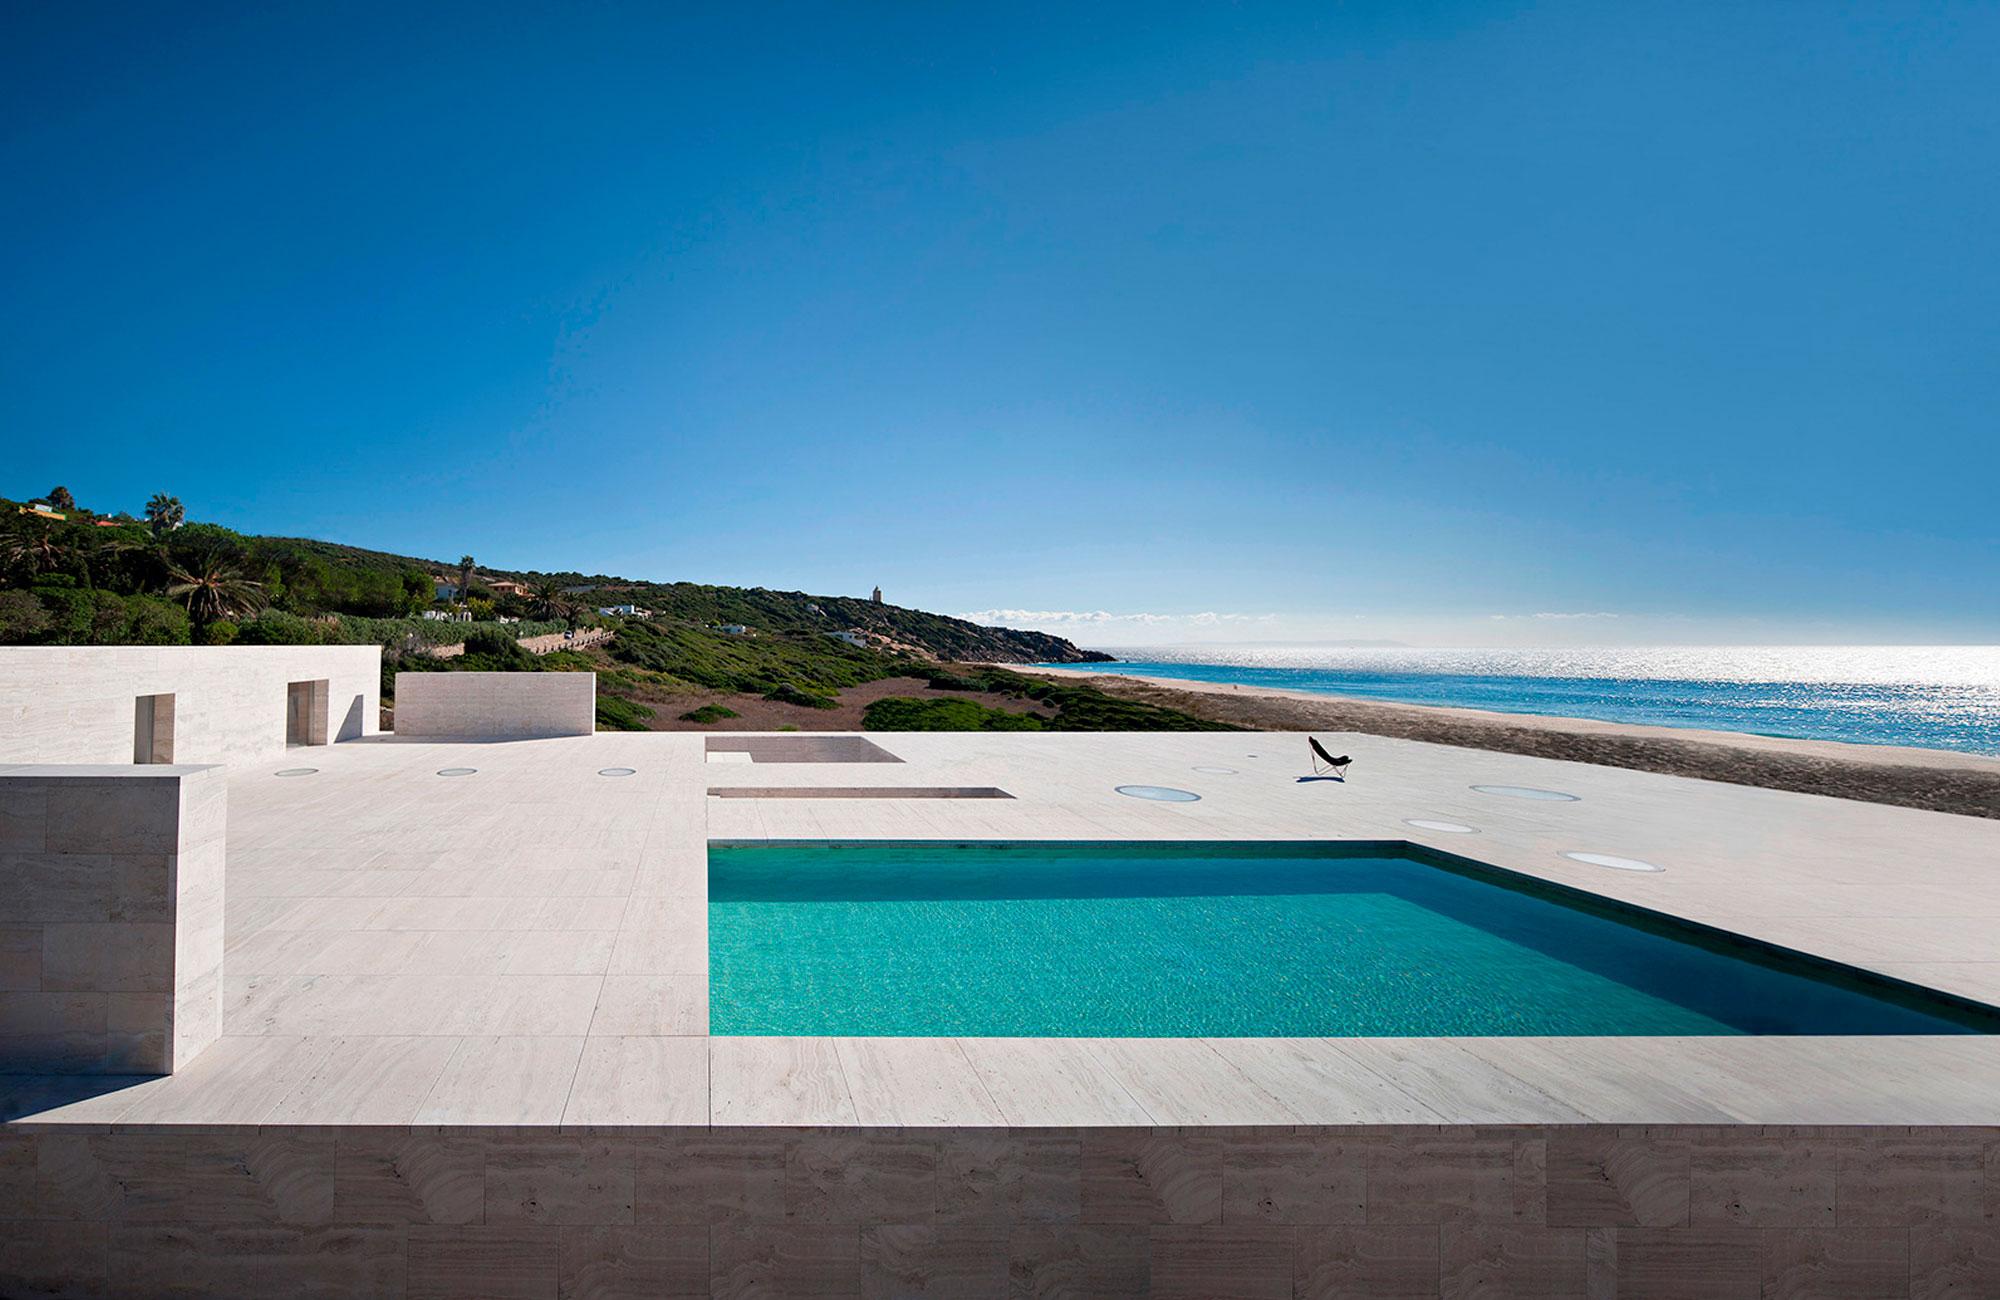 Swimming Pool Designs To Inspire You Gessato